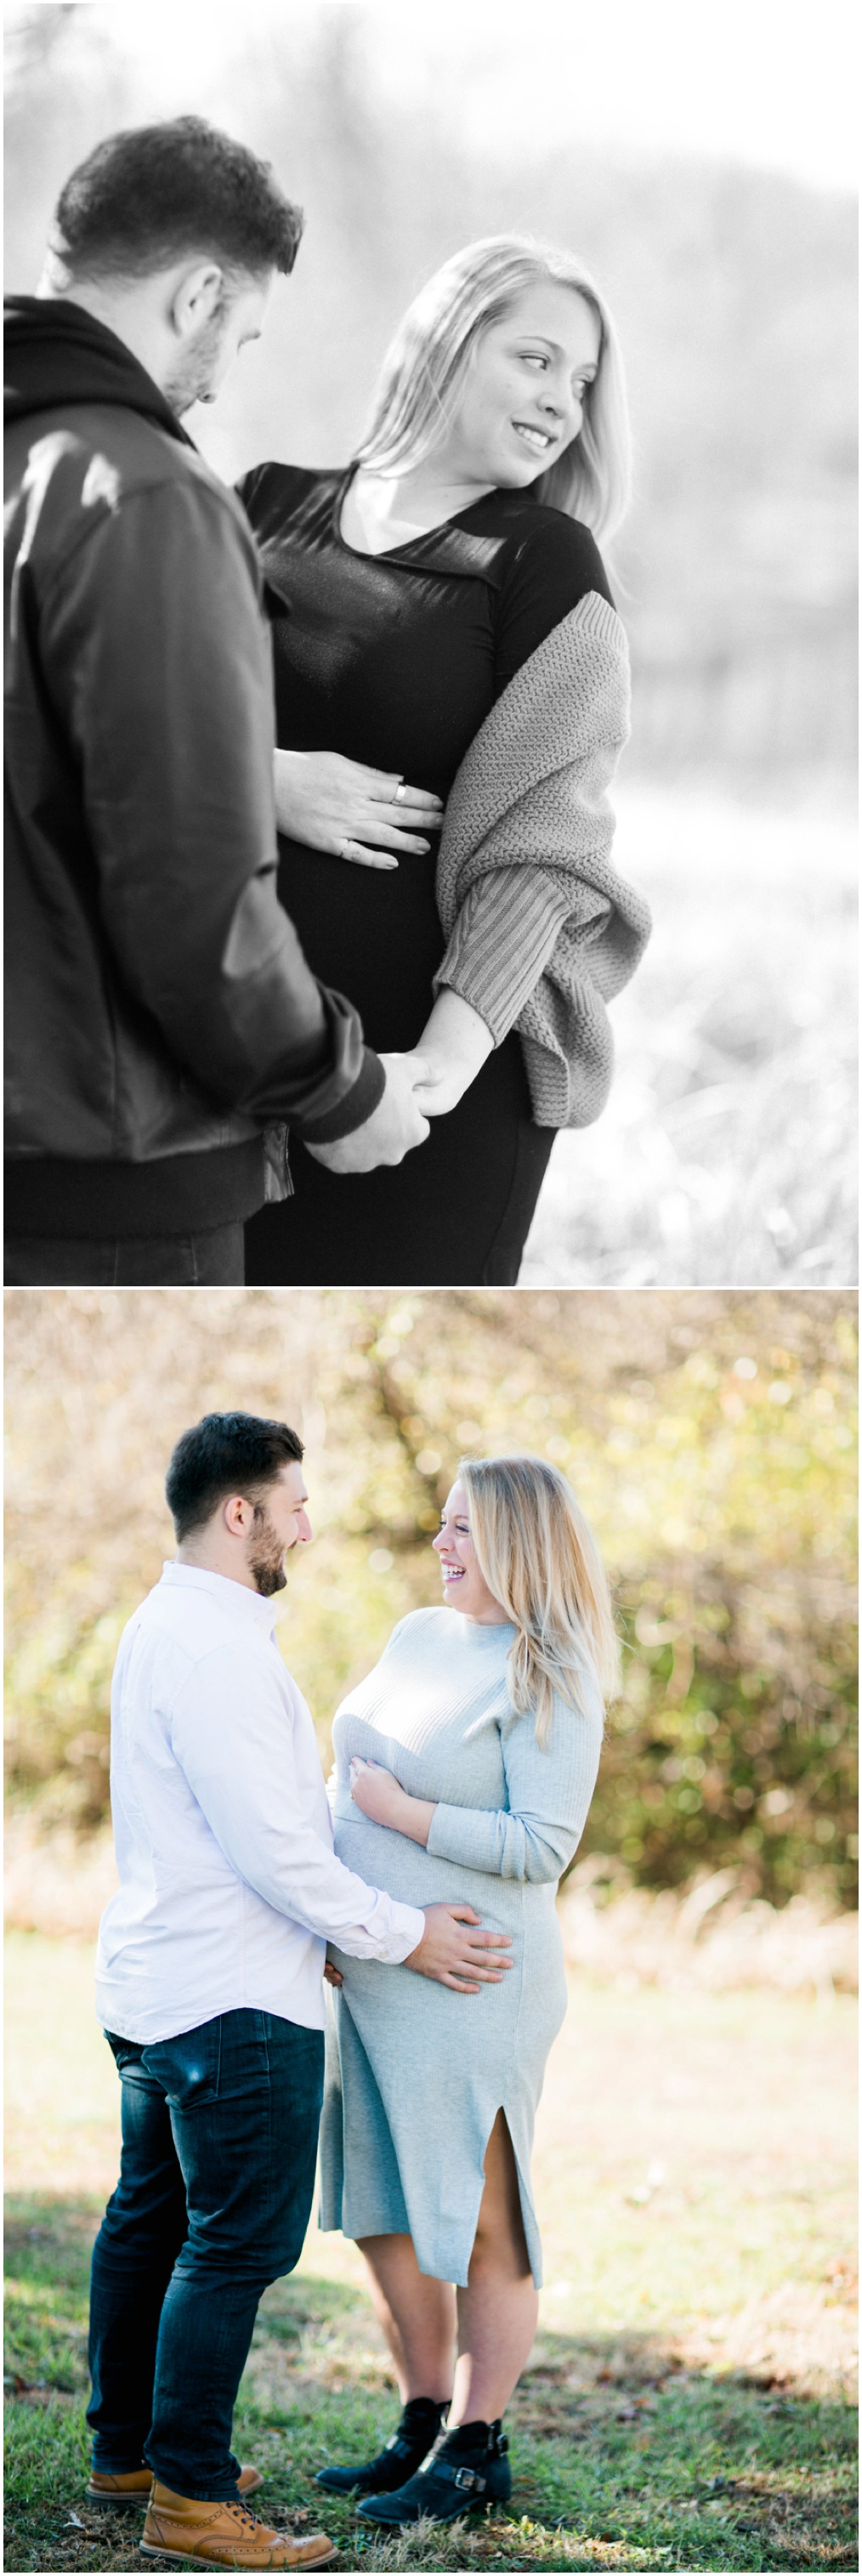 maternity-photographer-st-louis6.jpg